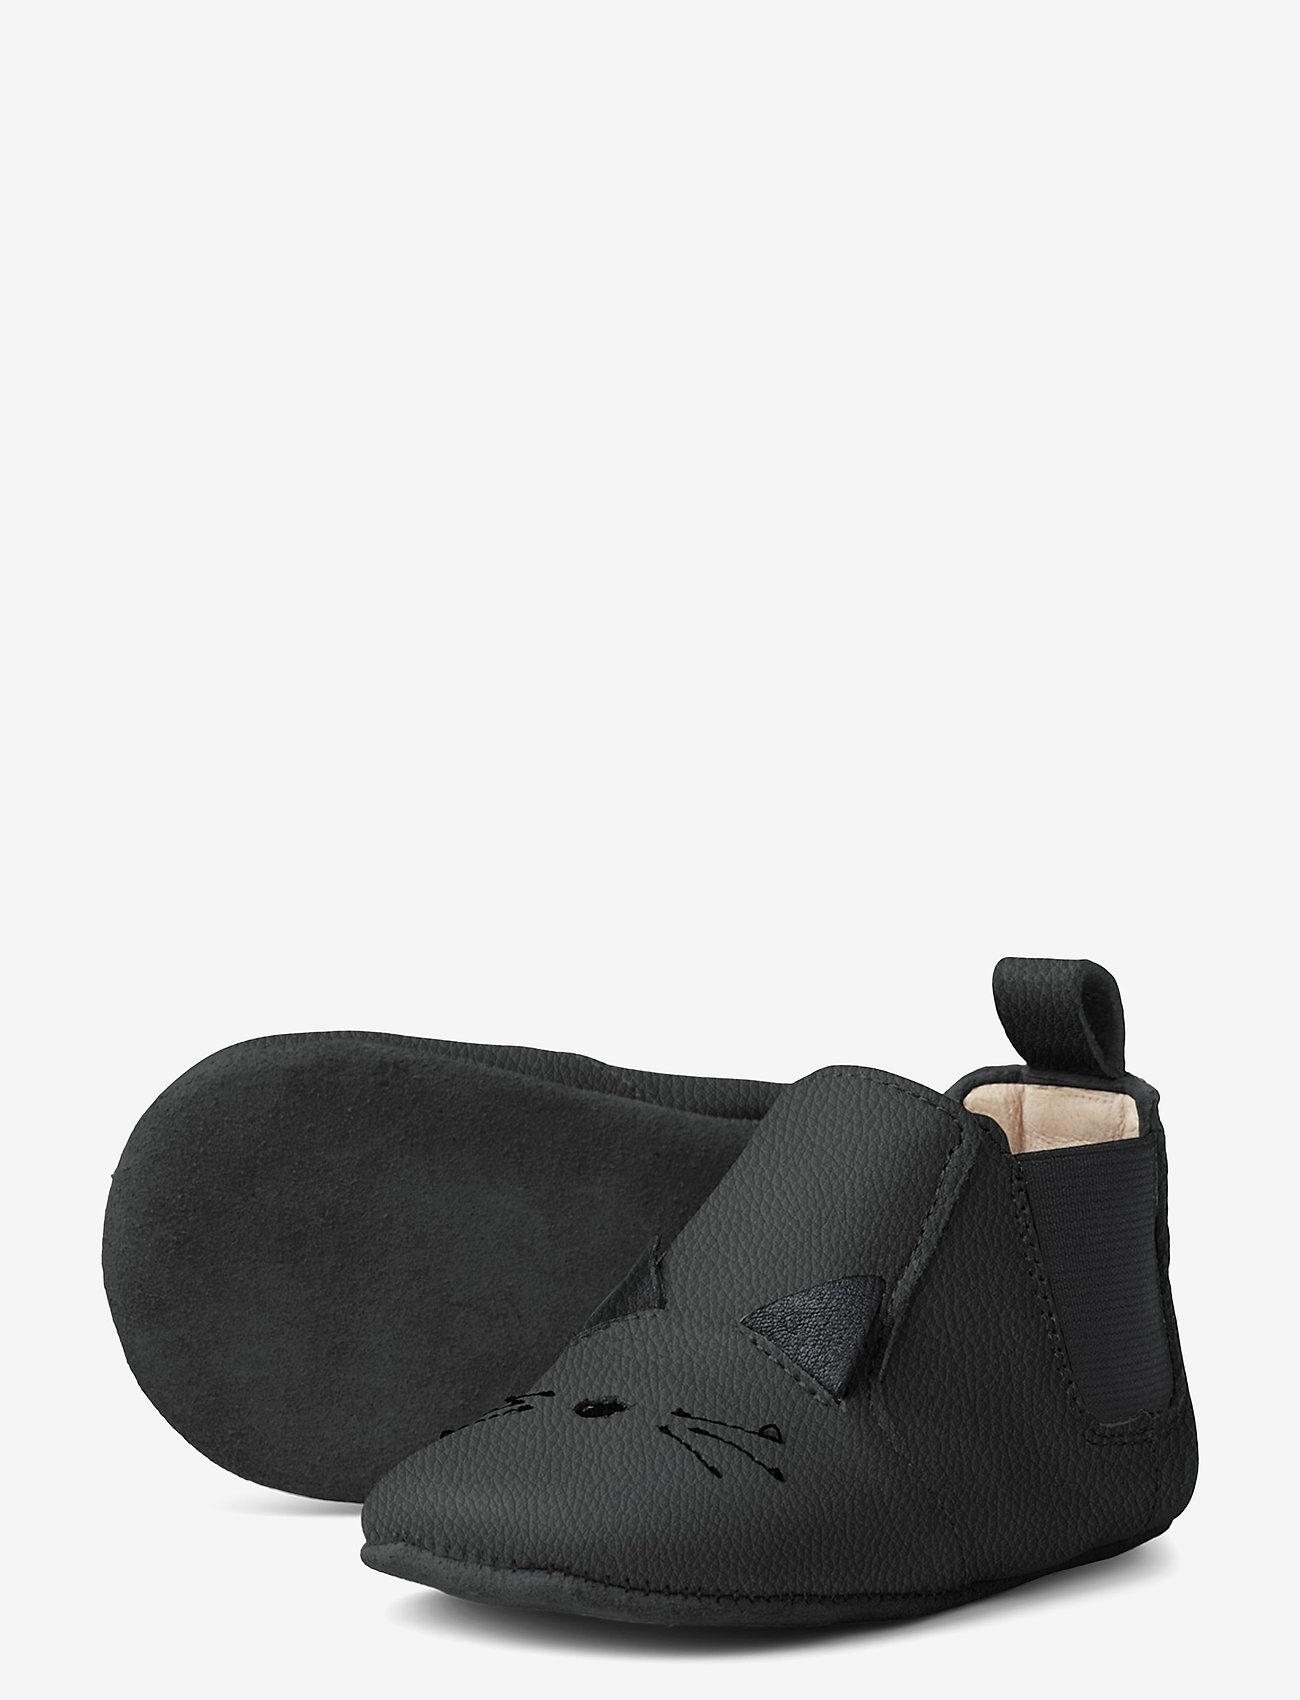 Liewood - Edith leather slippers - domowe - cat black - 1